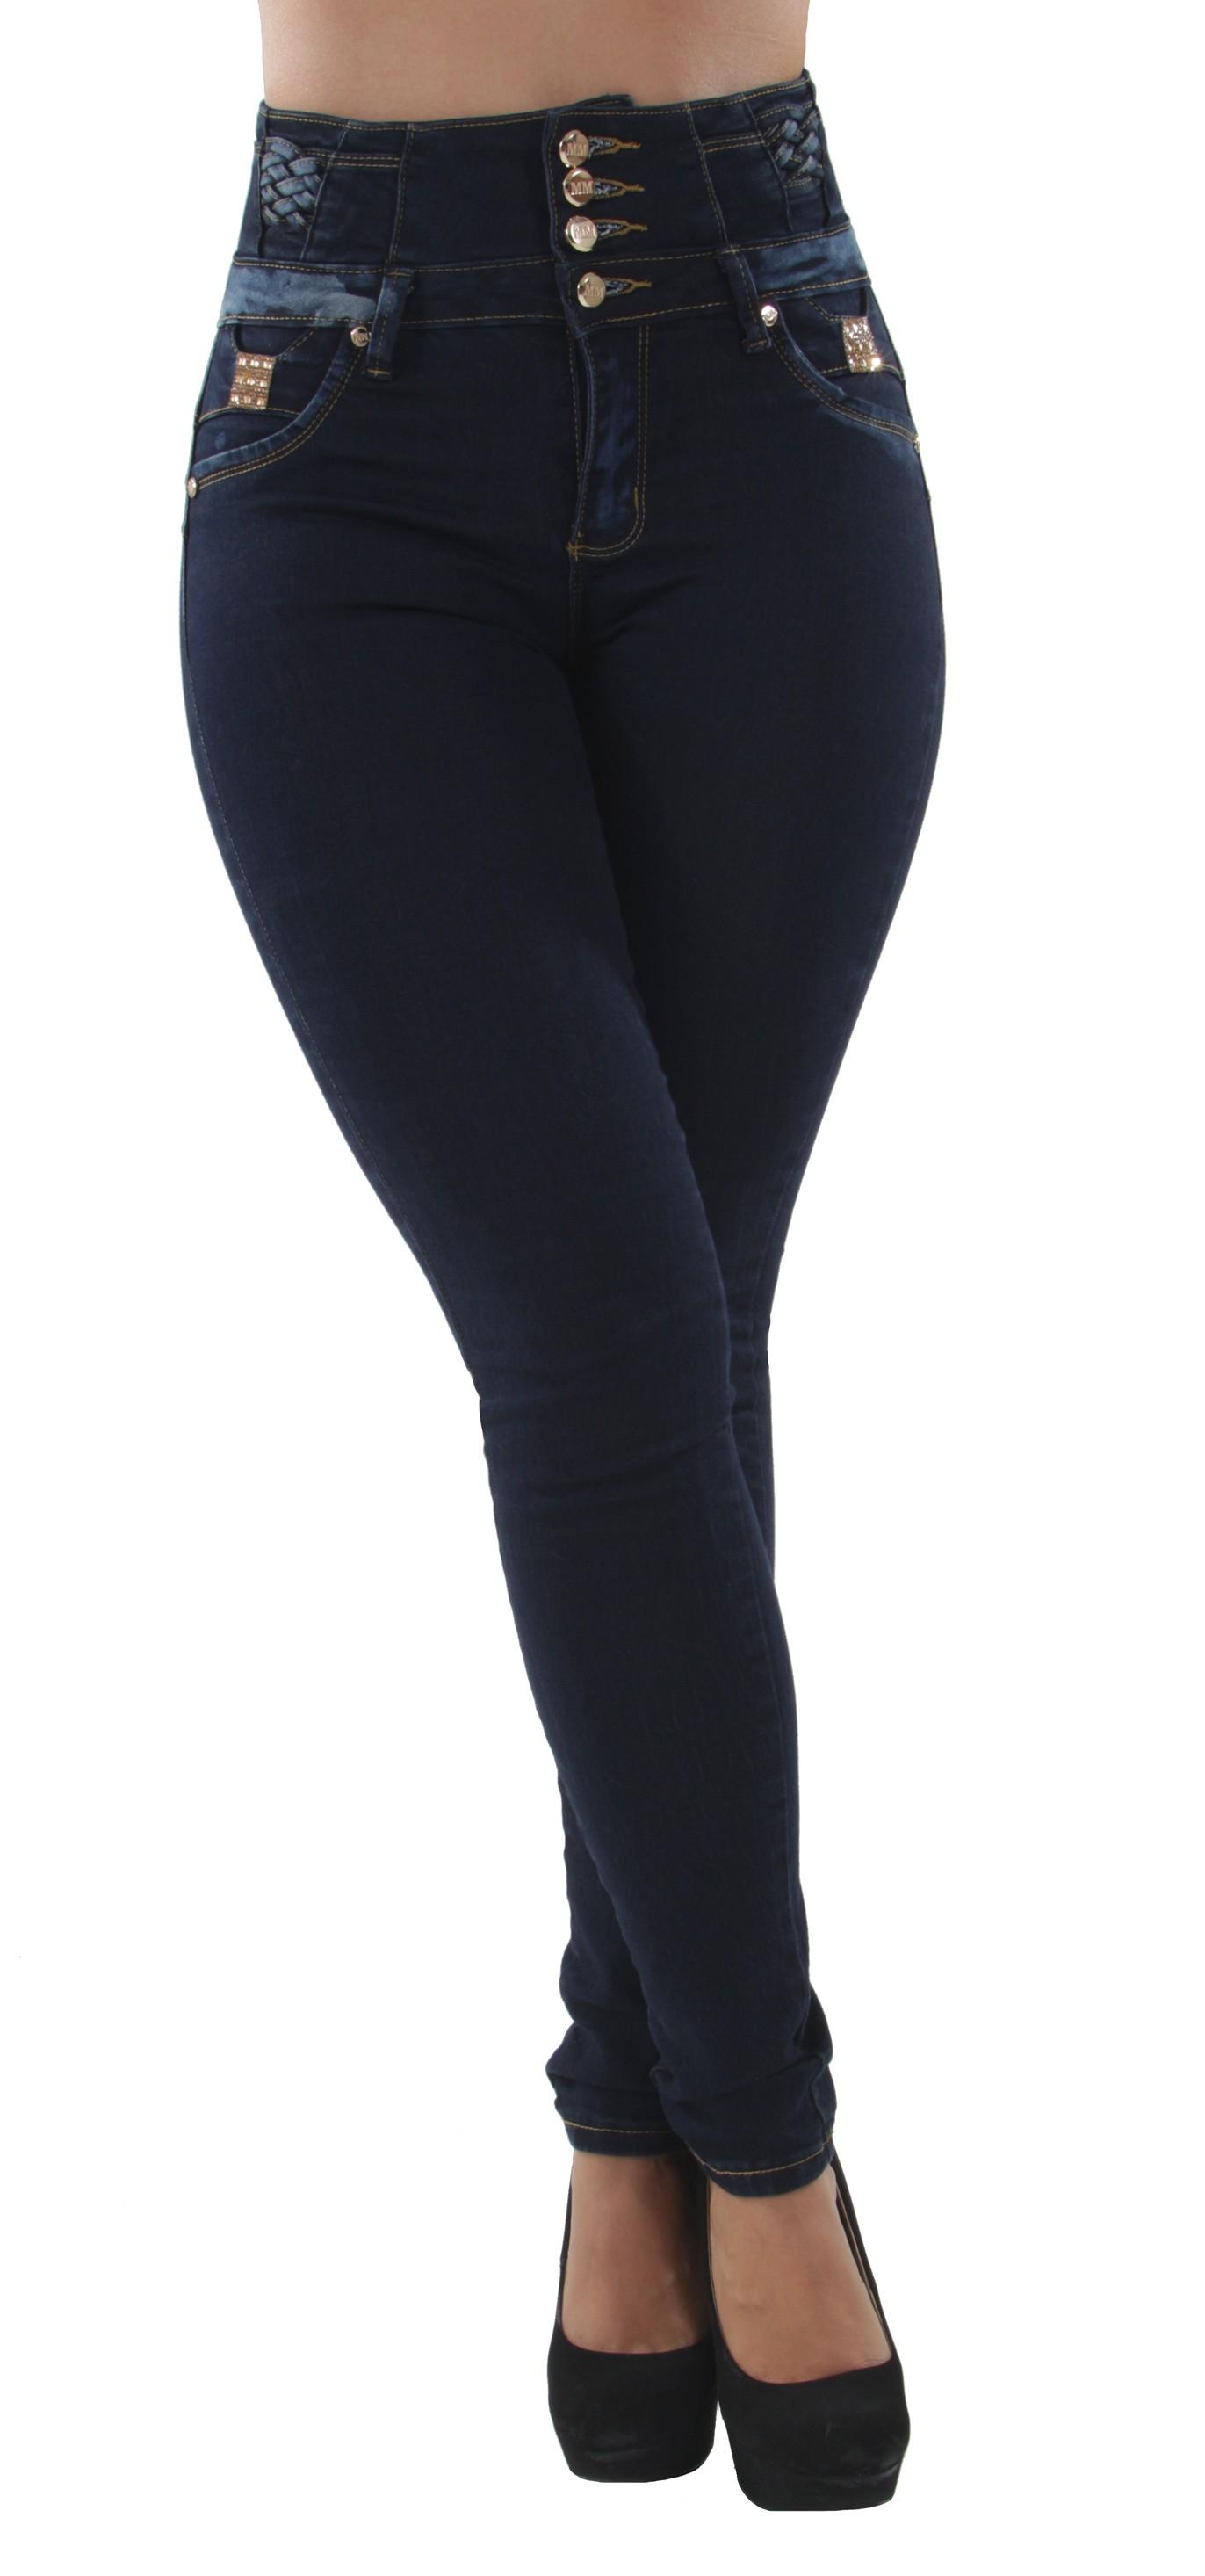 A10065-Colombian-Design-Butt-Lift-High-Elastic-Waist-Plus-Junior-Skinny-Jeans